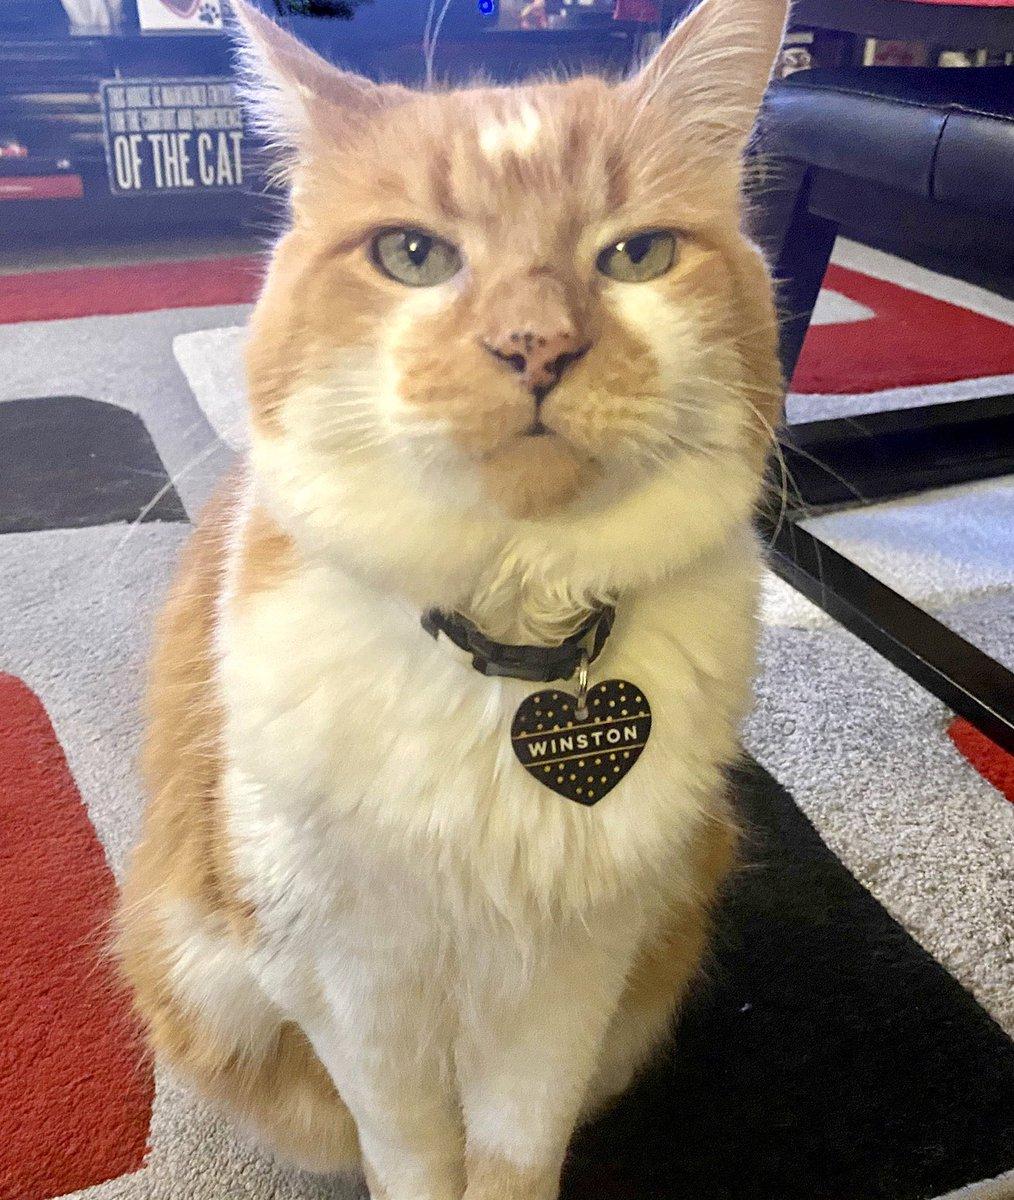 Feelin distinguished, duh. #cats #CatsOfTwitter #cute  #Quarantine #pets #WFHpic.twitter.com/bFqPFCU4Lb